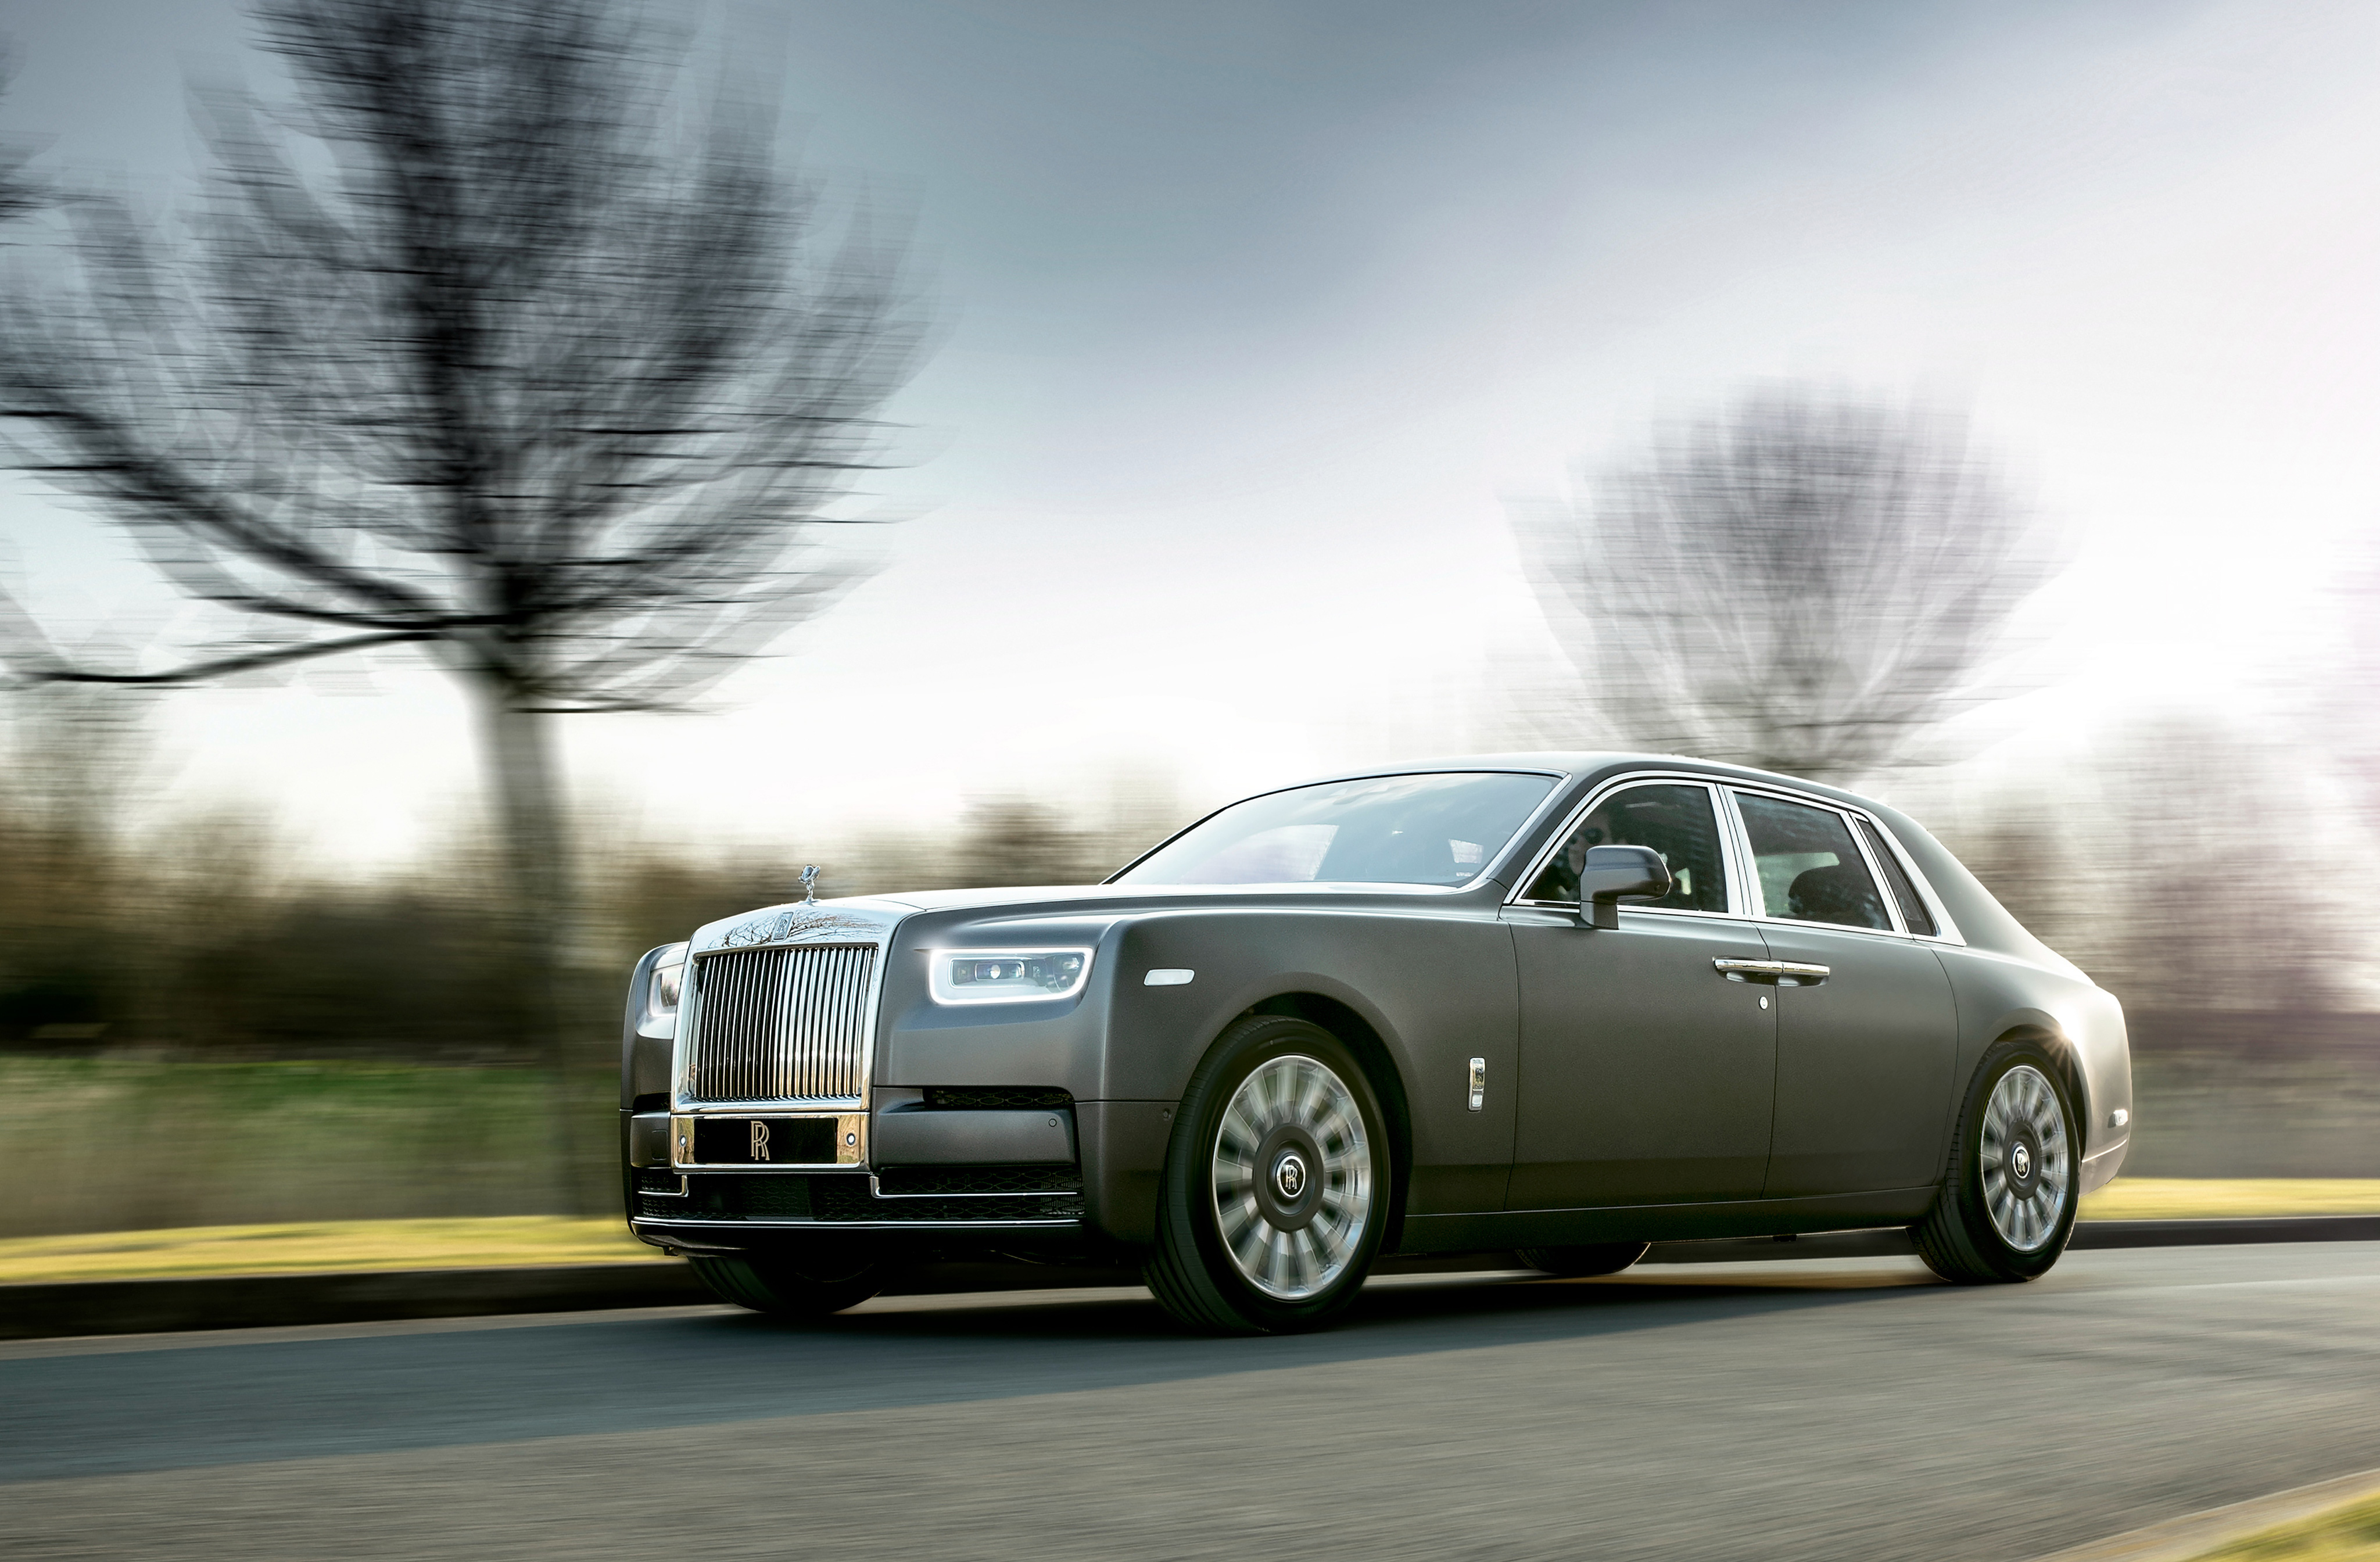 2018 Rolls Royce Phantom The Gentlemans Tourer Hd Cars 4k